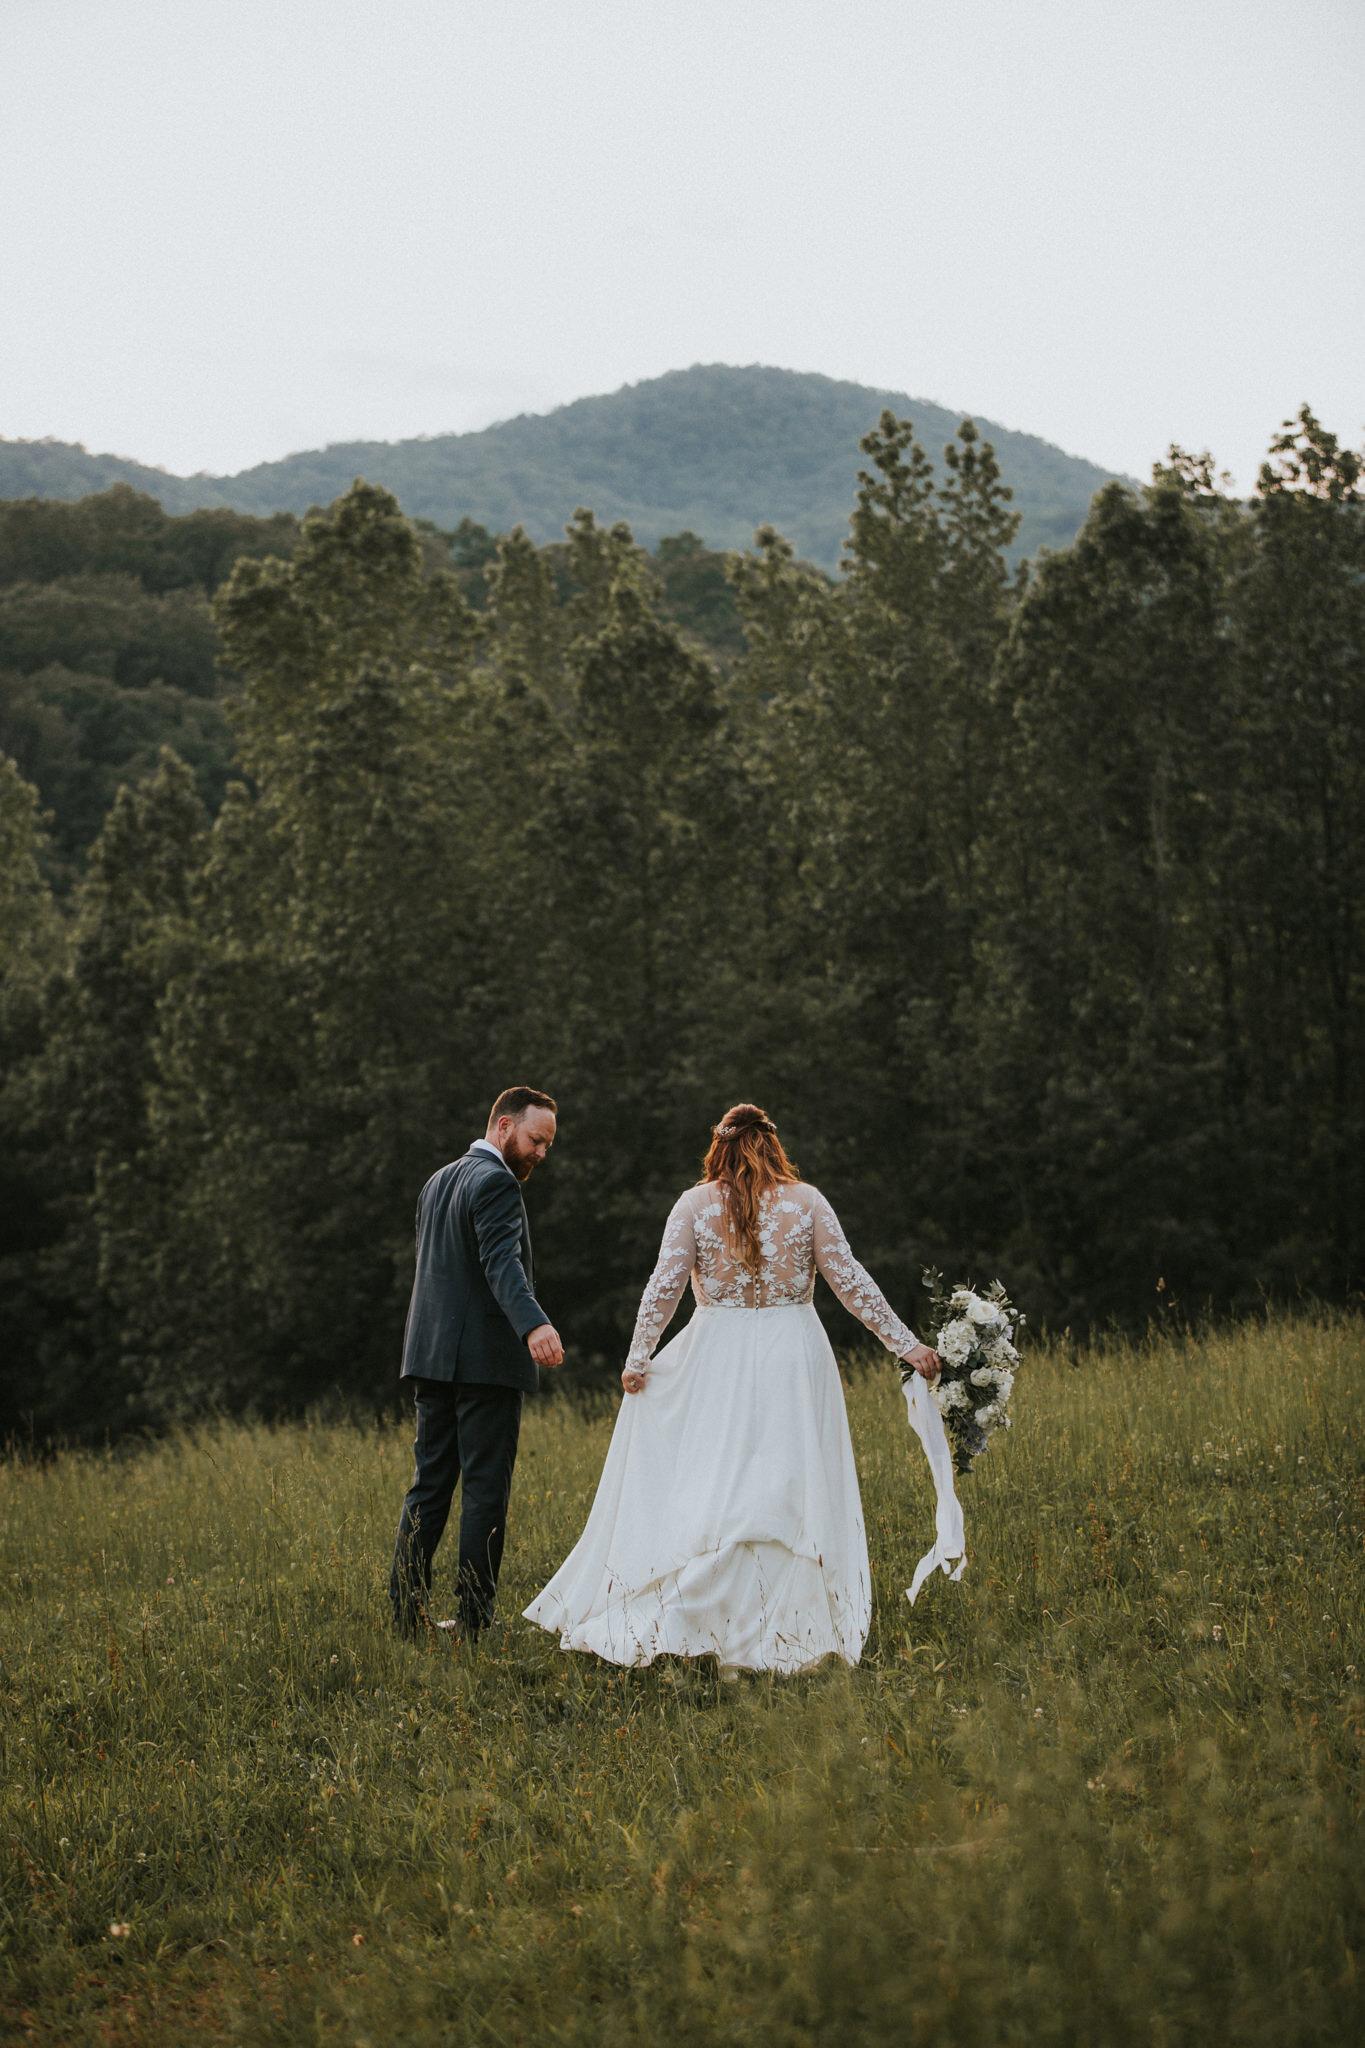 KateMatt-North-Georgia-Wedding-Photographer-Mountain-Laurel-Farm-138.jpg